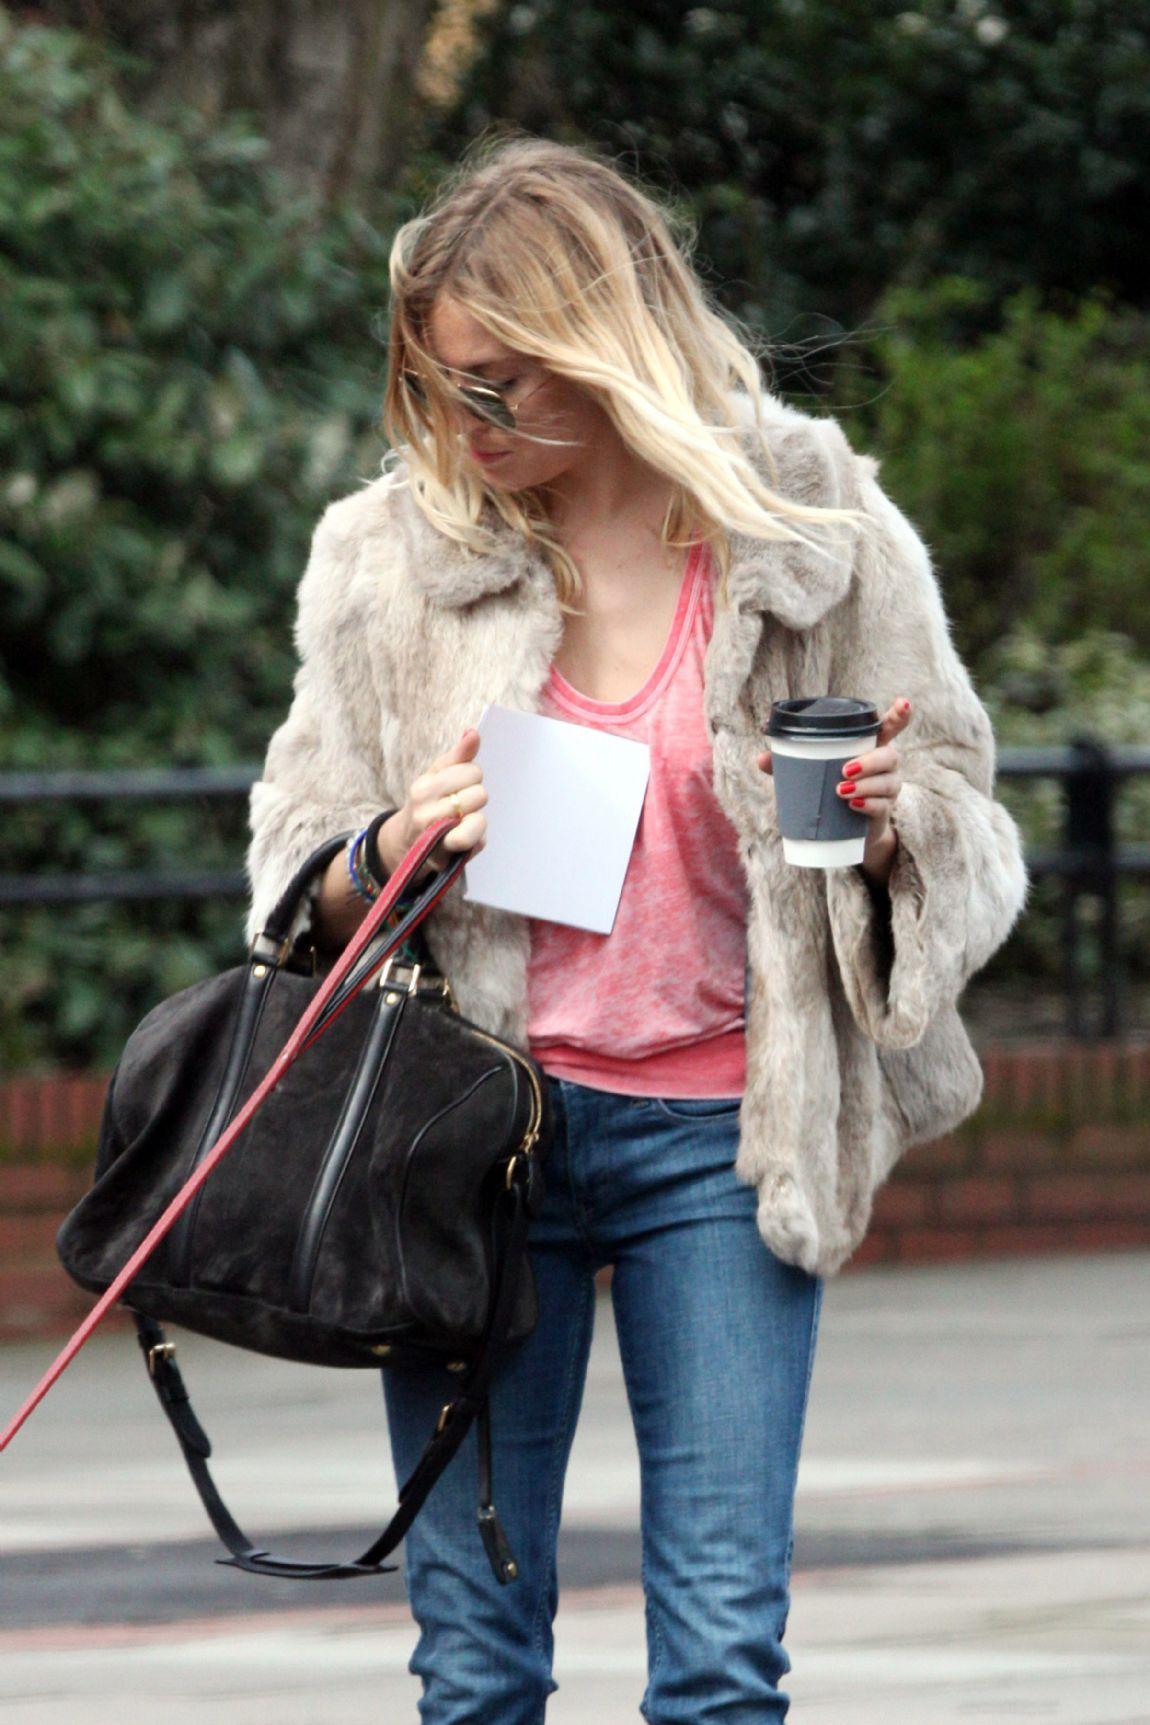 536d75c7a480 ... bag By Sofia Coppola for Louis Vuitton. 3 Comments · rs129105521100579. Sienna  Miller ...